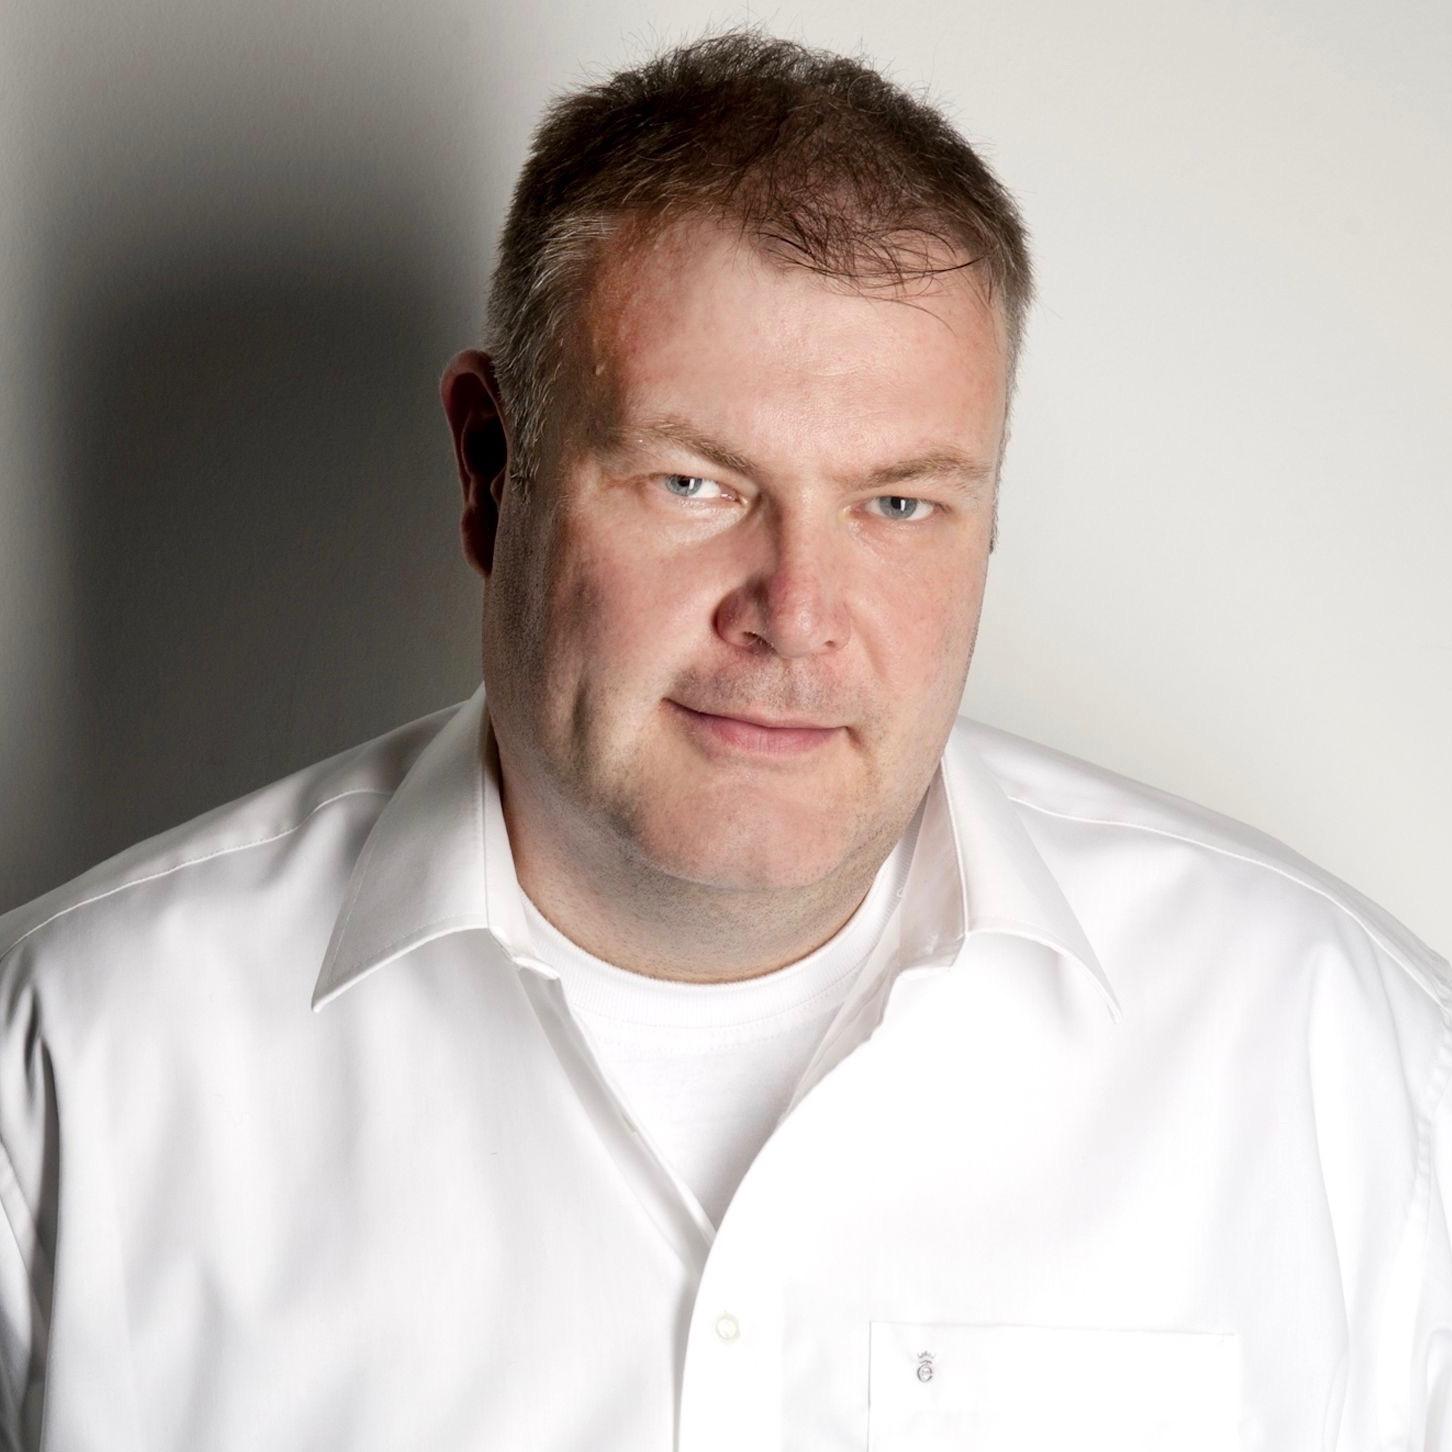 Christian Wehrheim